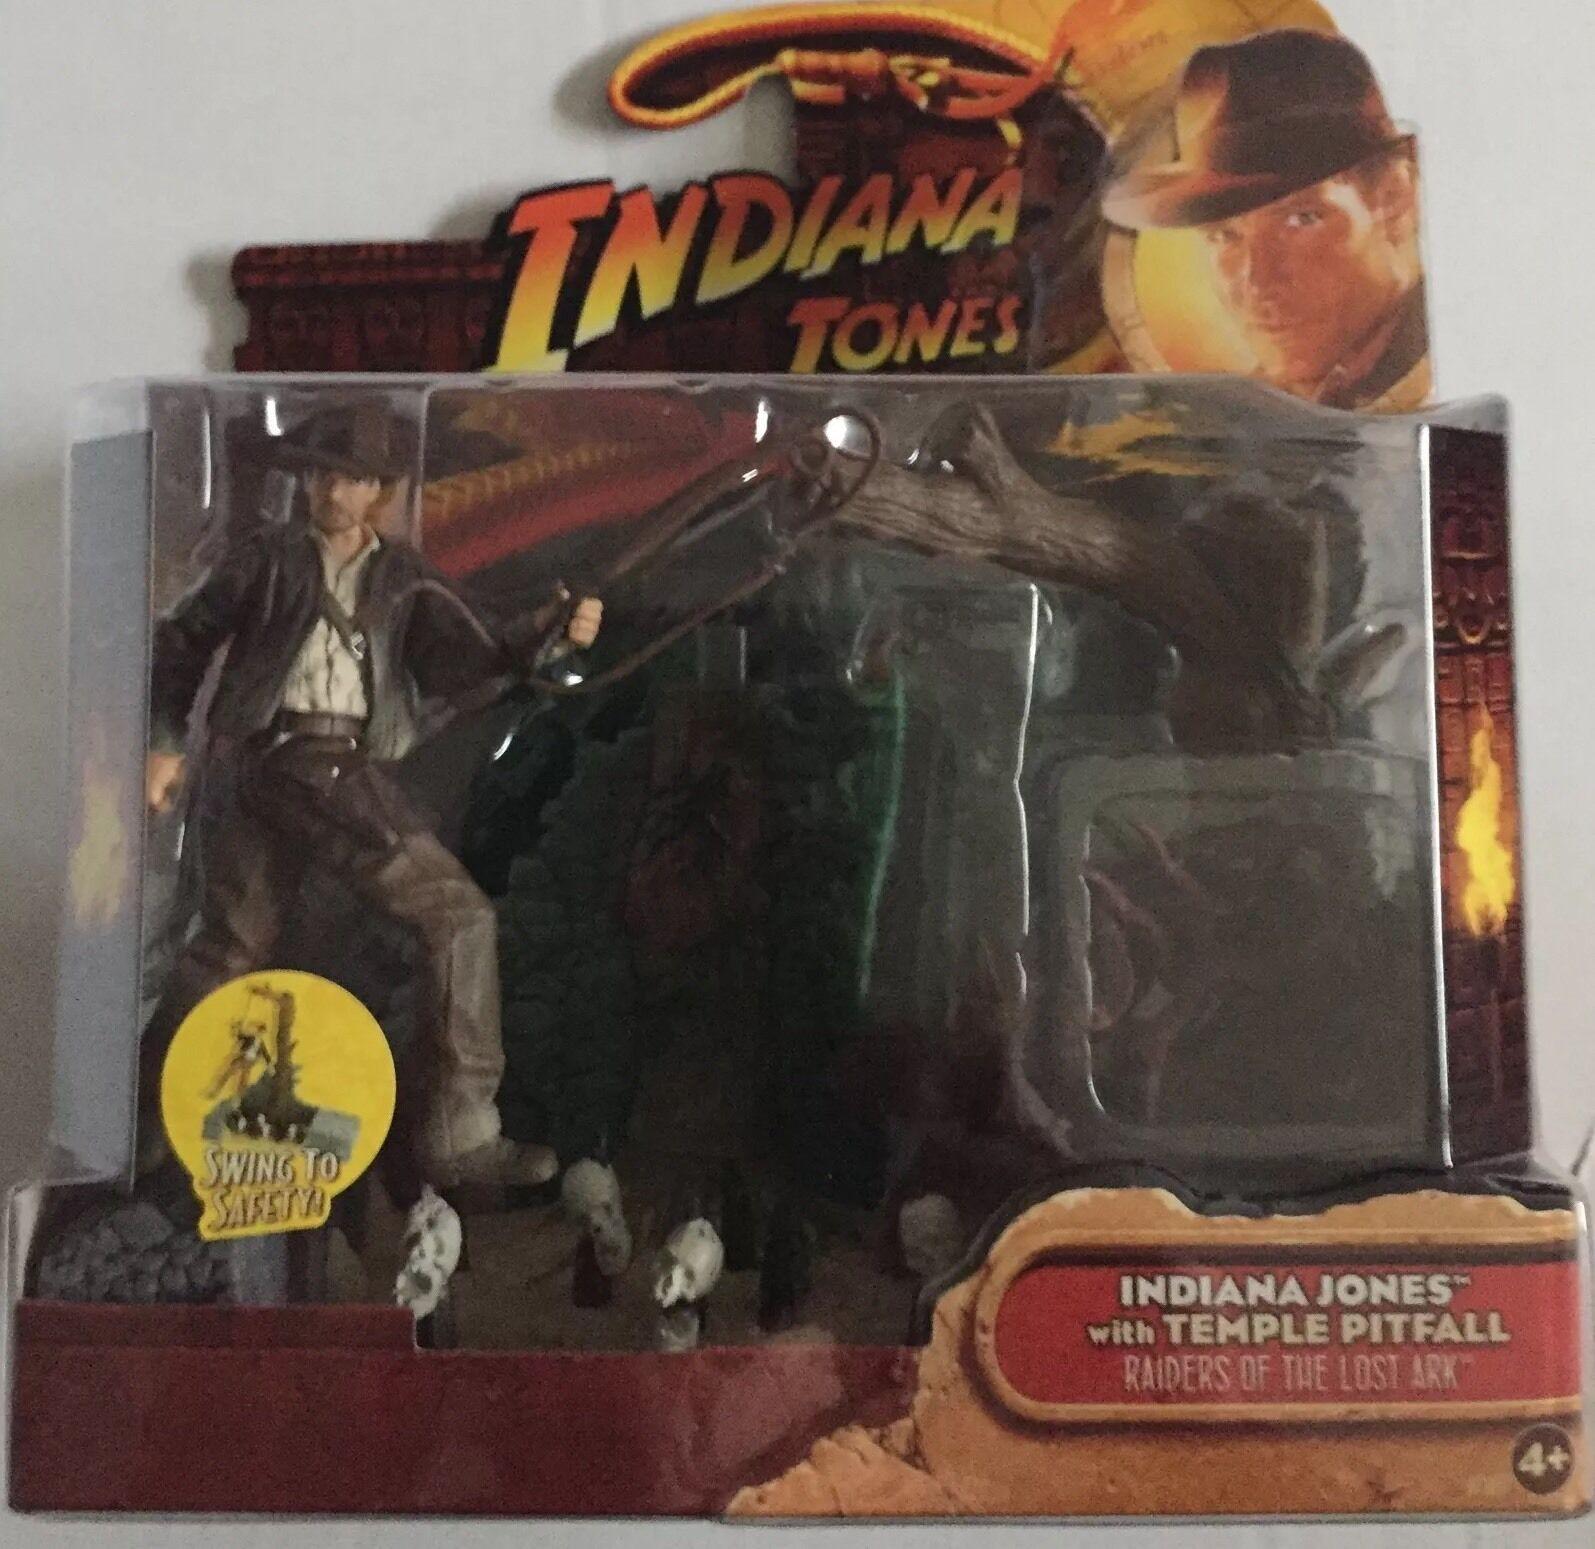 Indiana Jones Action Figure of INDIANA JONES And TEMPLE PITFALL 3.75